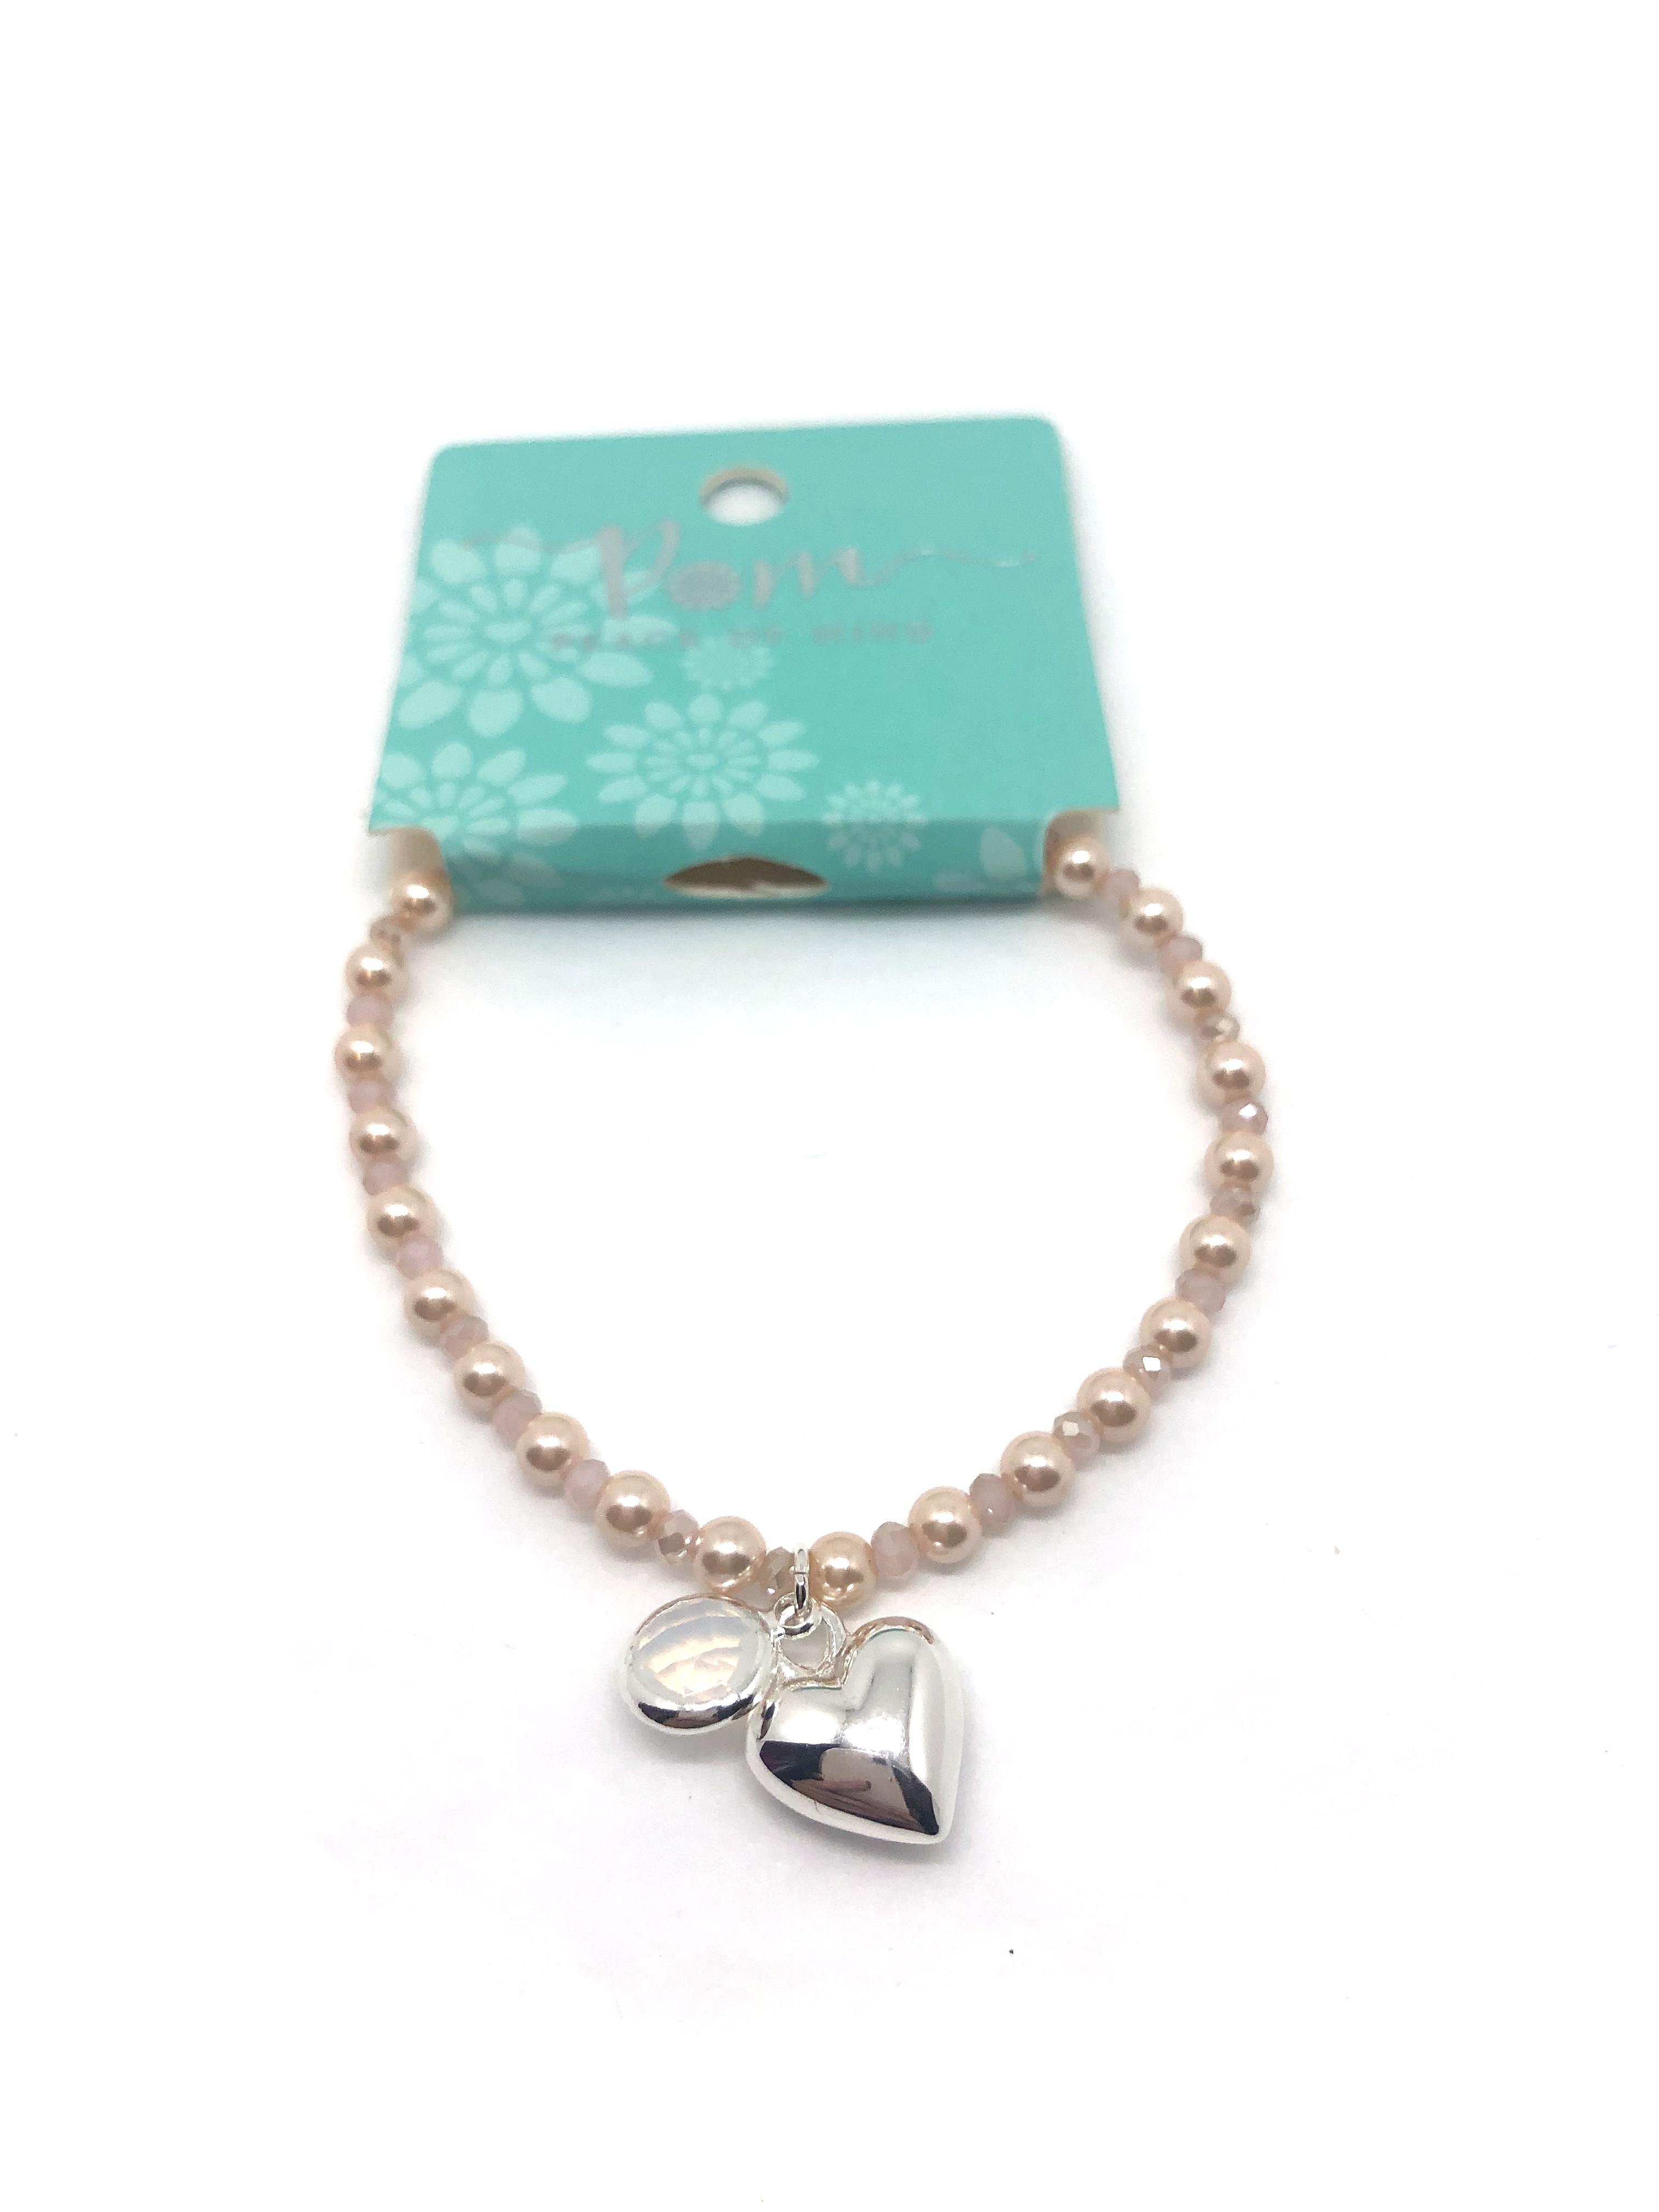 Bracelet (Pom) Silver Heart & Crystal on Pink Pearl